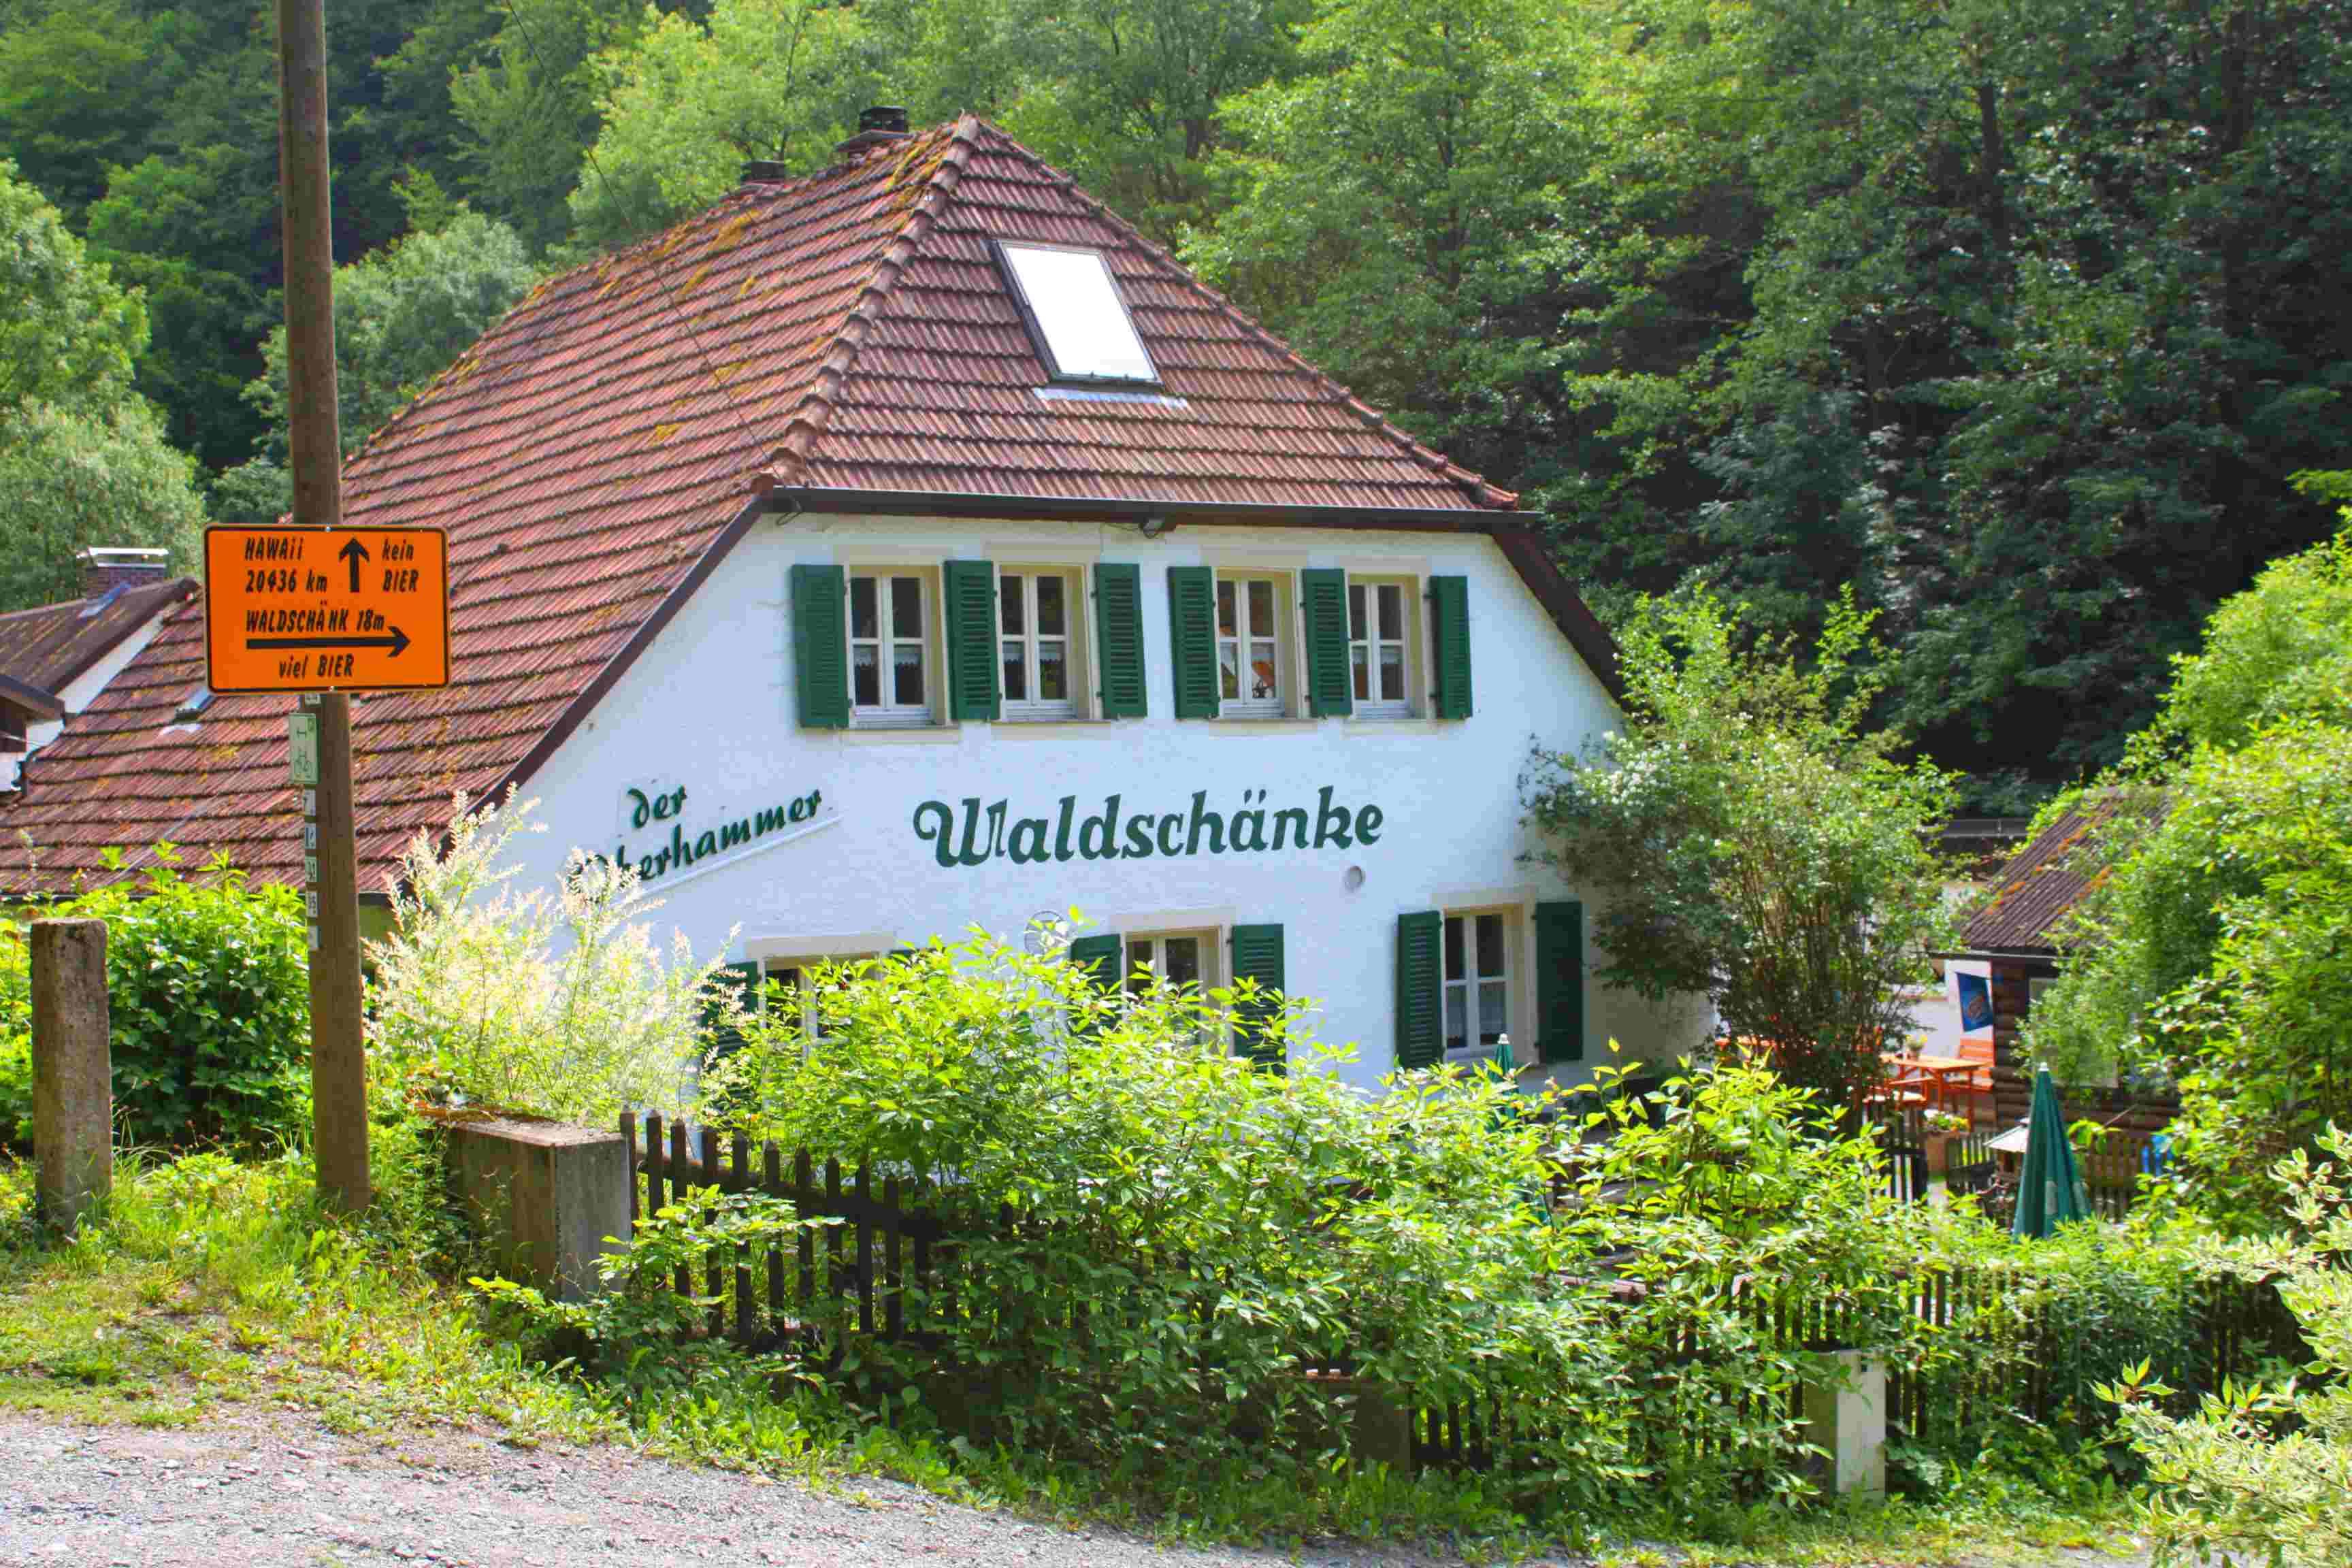 File:Steinachtal Waldschänke.JPG - Wikimedia Commons